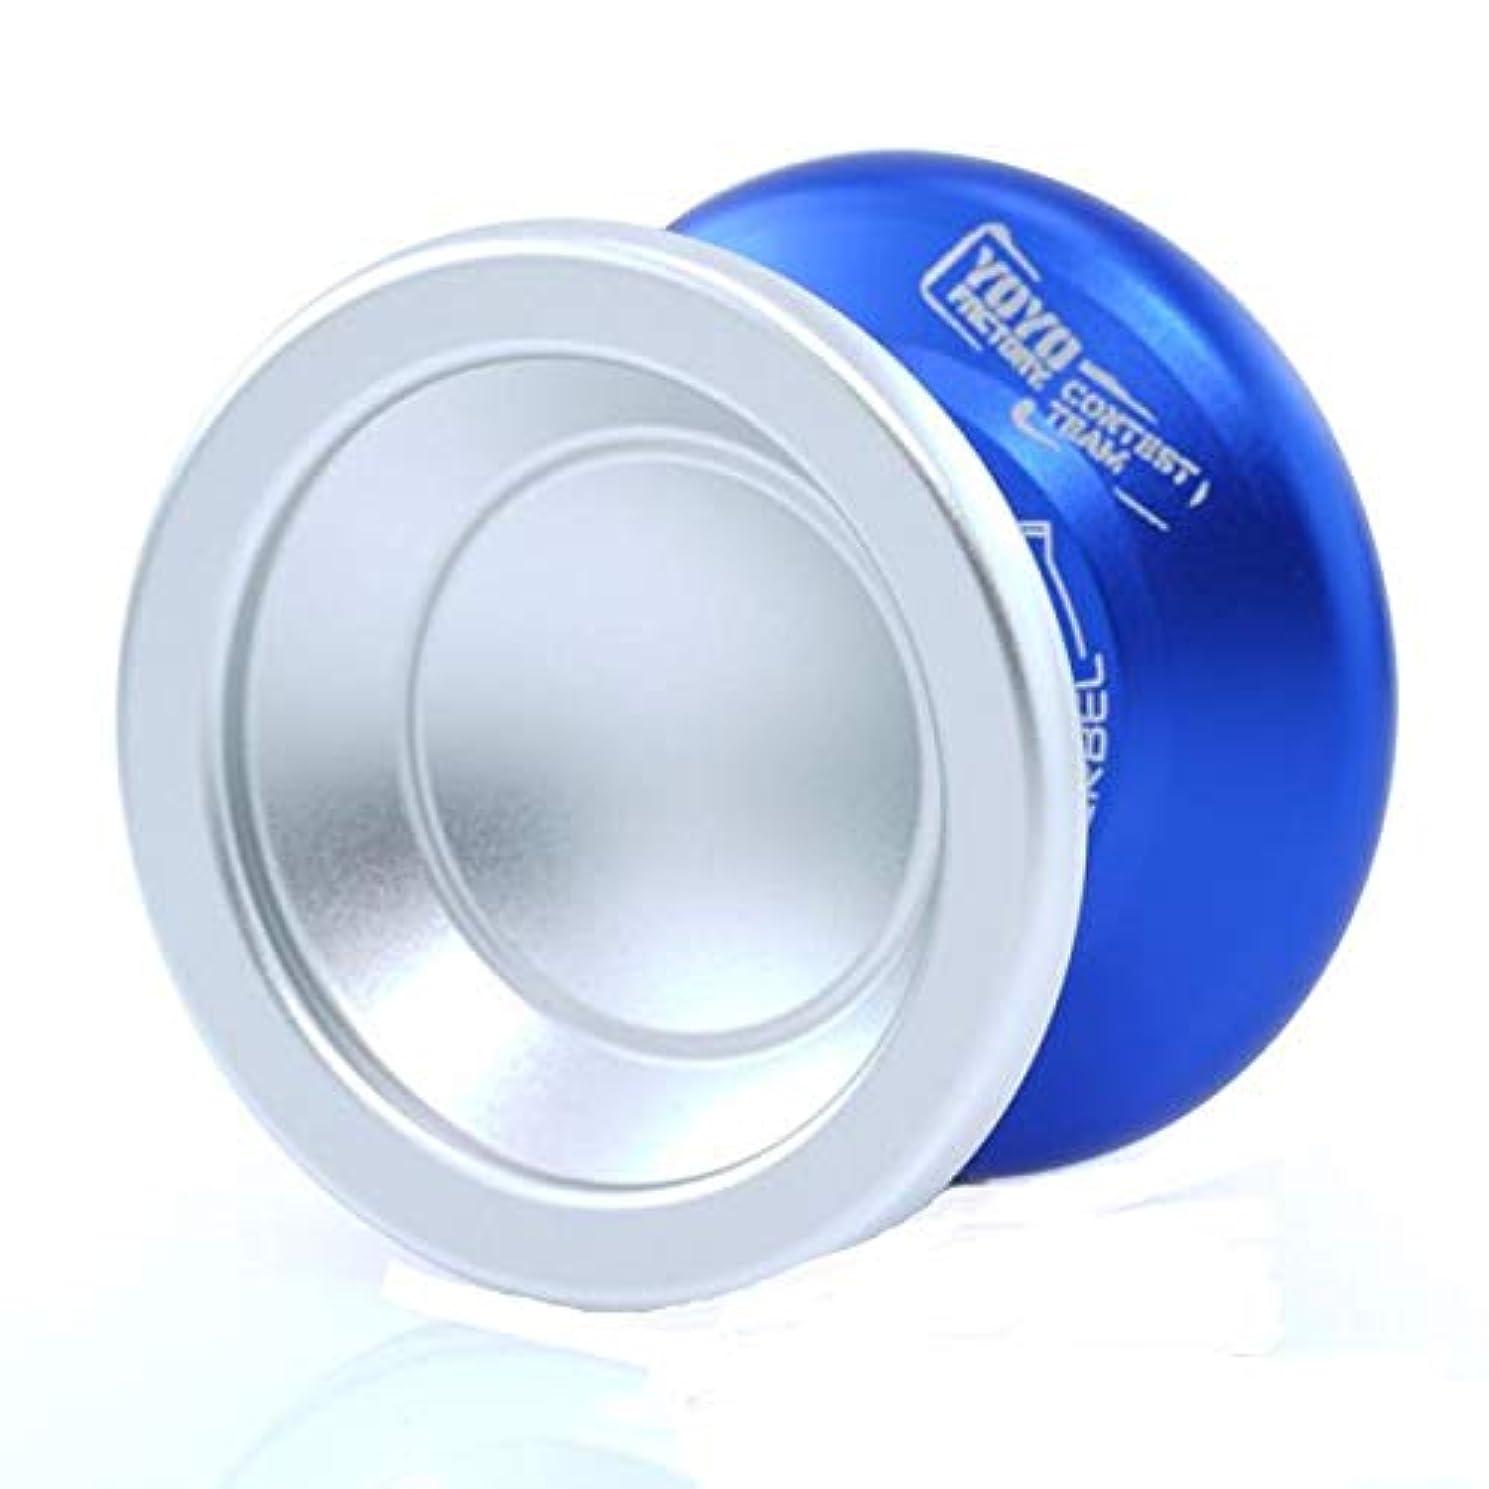 YoYoFactory Horizon Yoyo Style Team EDT Colors Blue Silver